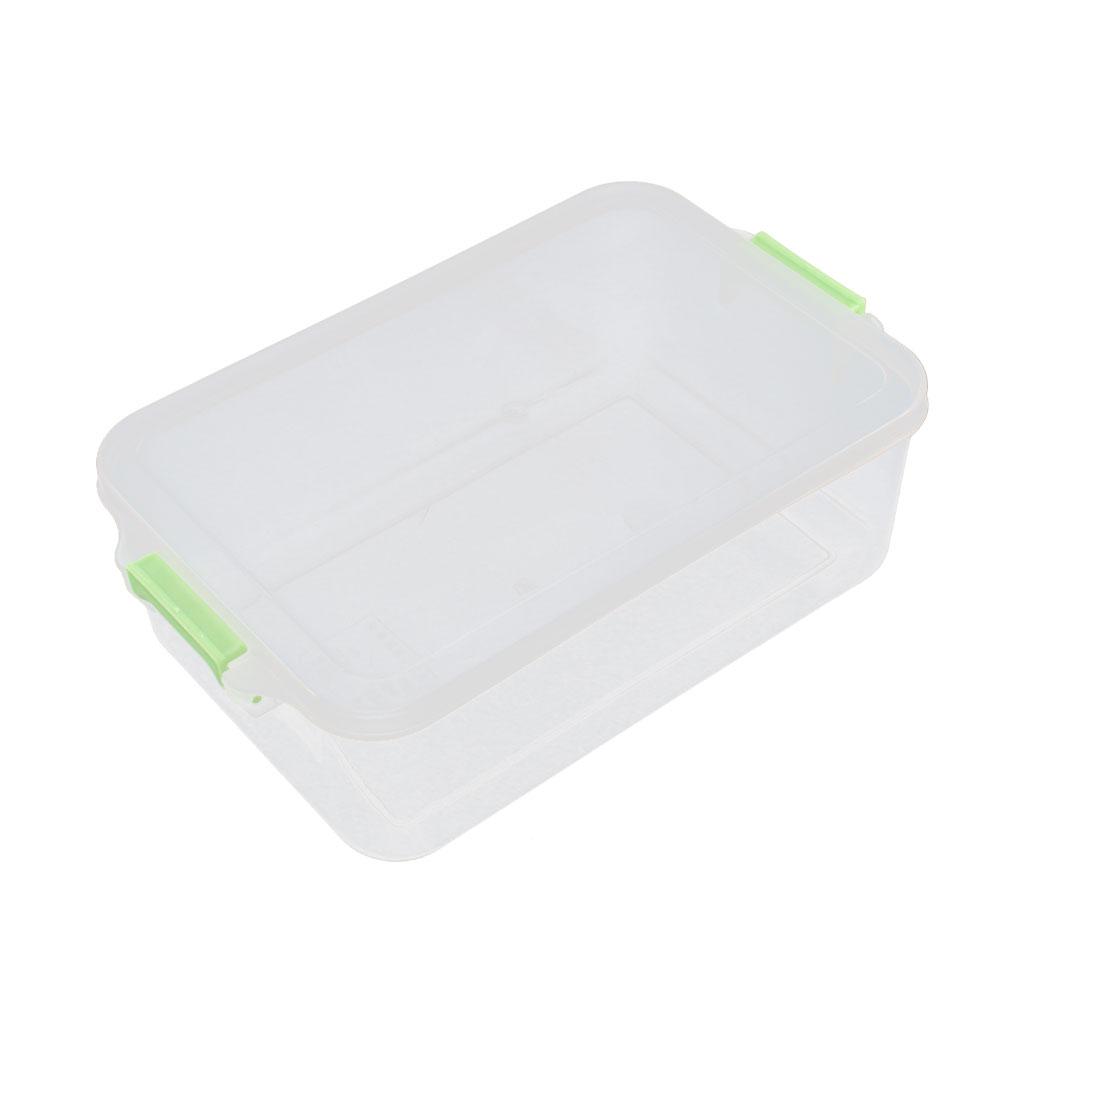 Heat Resistance 120 Degree Bento Crisper Case Food Storage Box Green Clear